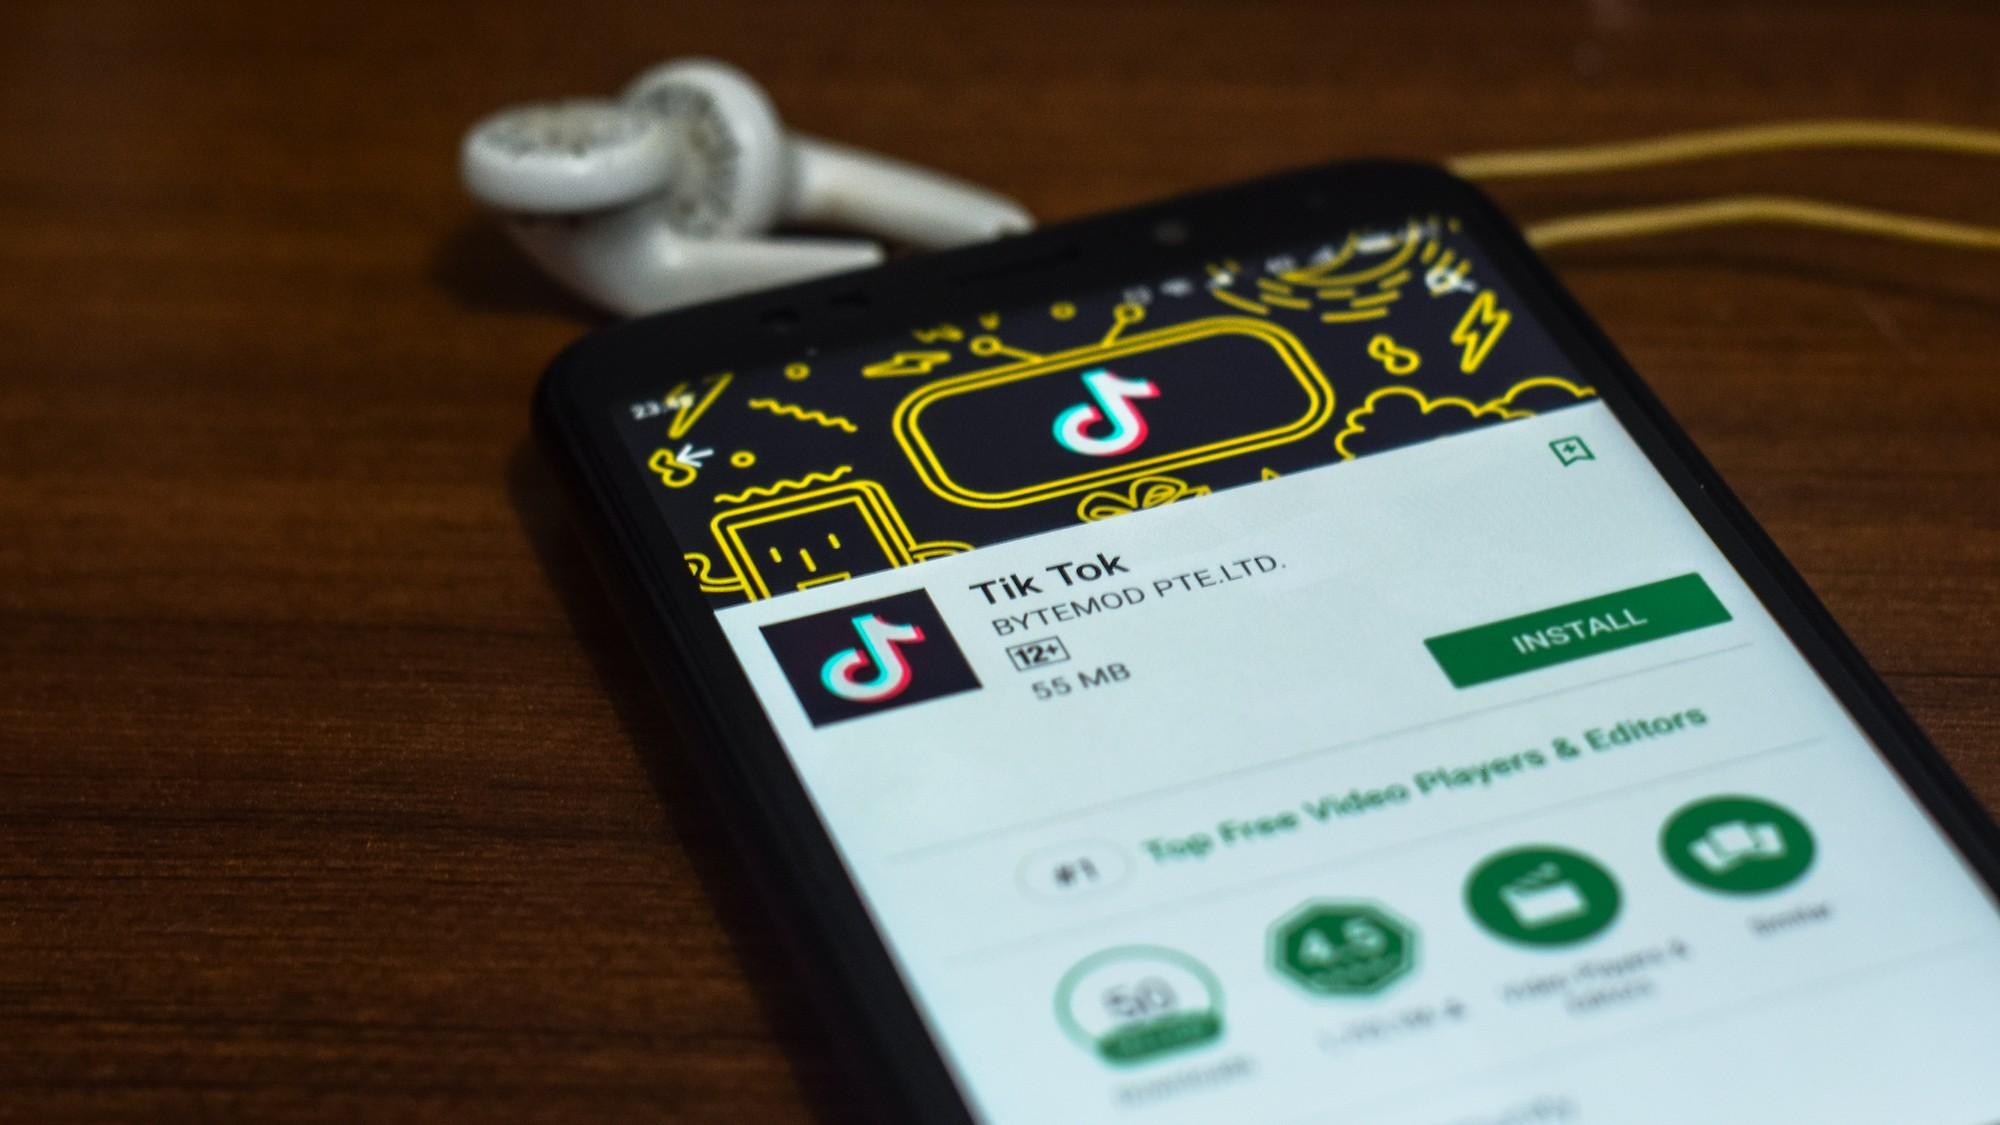 Tiktok The App Super Popular With Kids Has A Nudes Problem